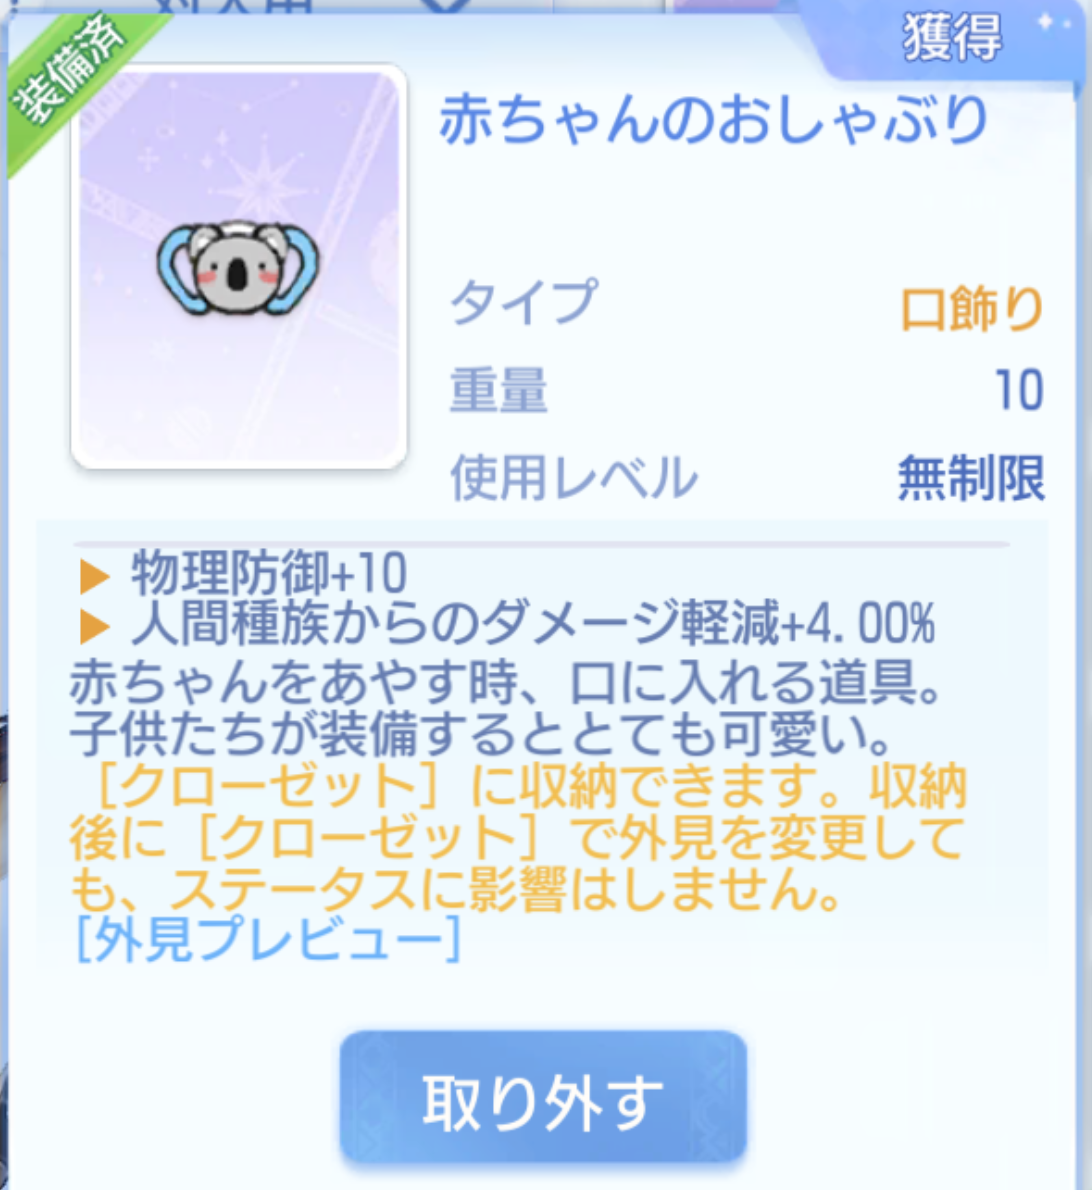 f:id:yamada_ragnarok:20210815041424p:plain